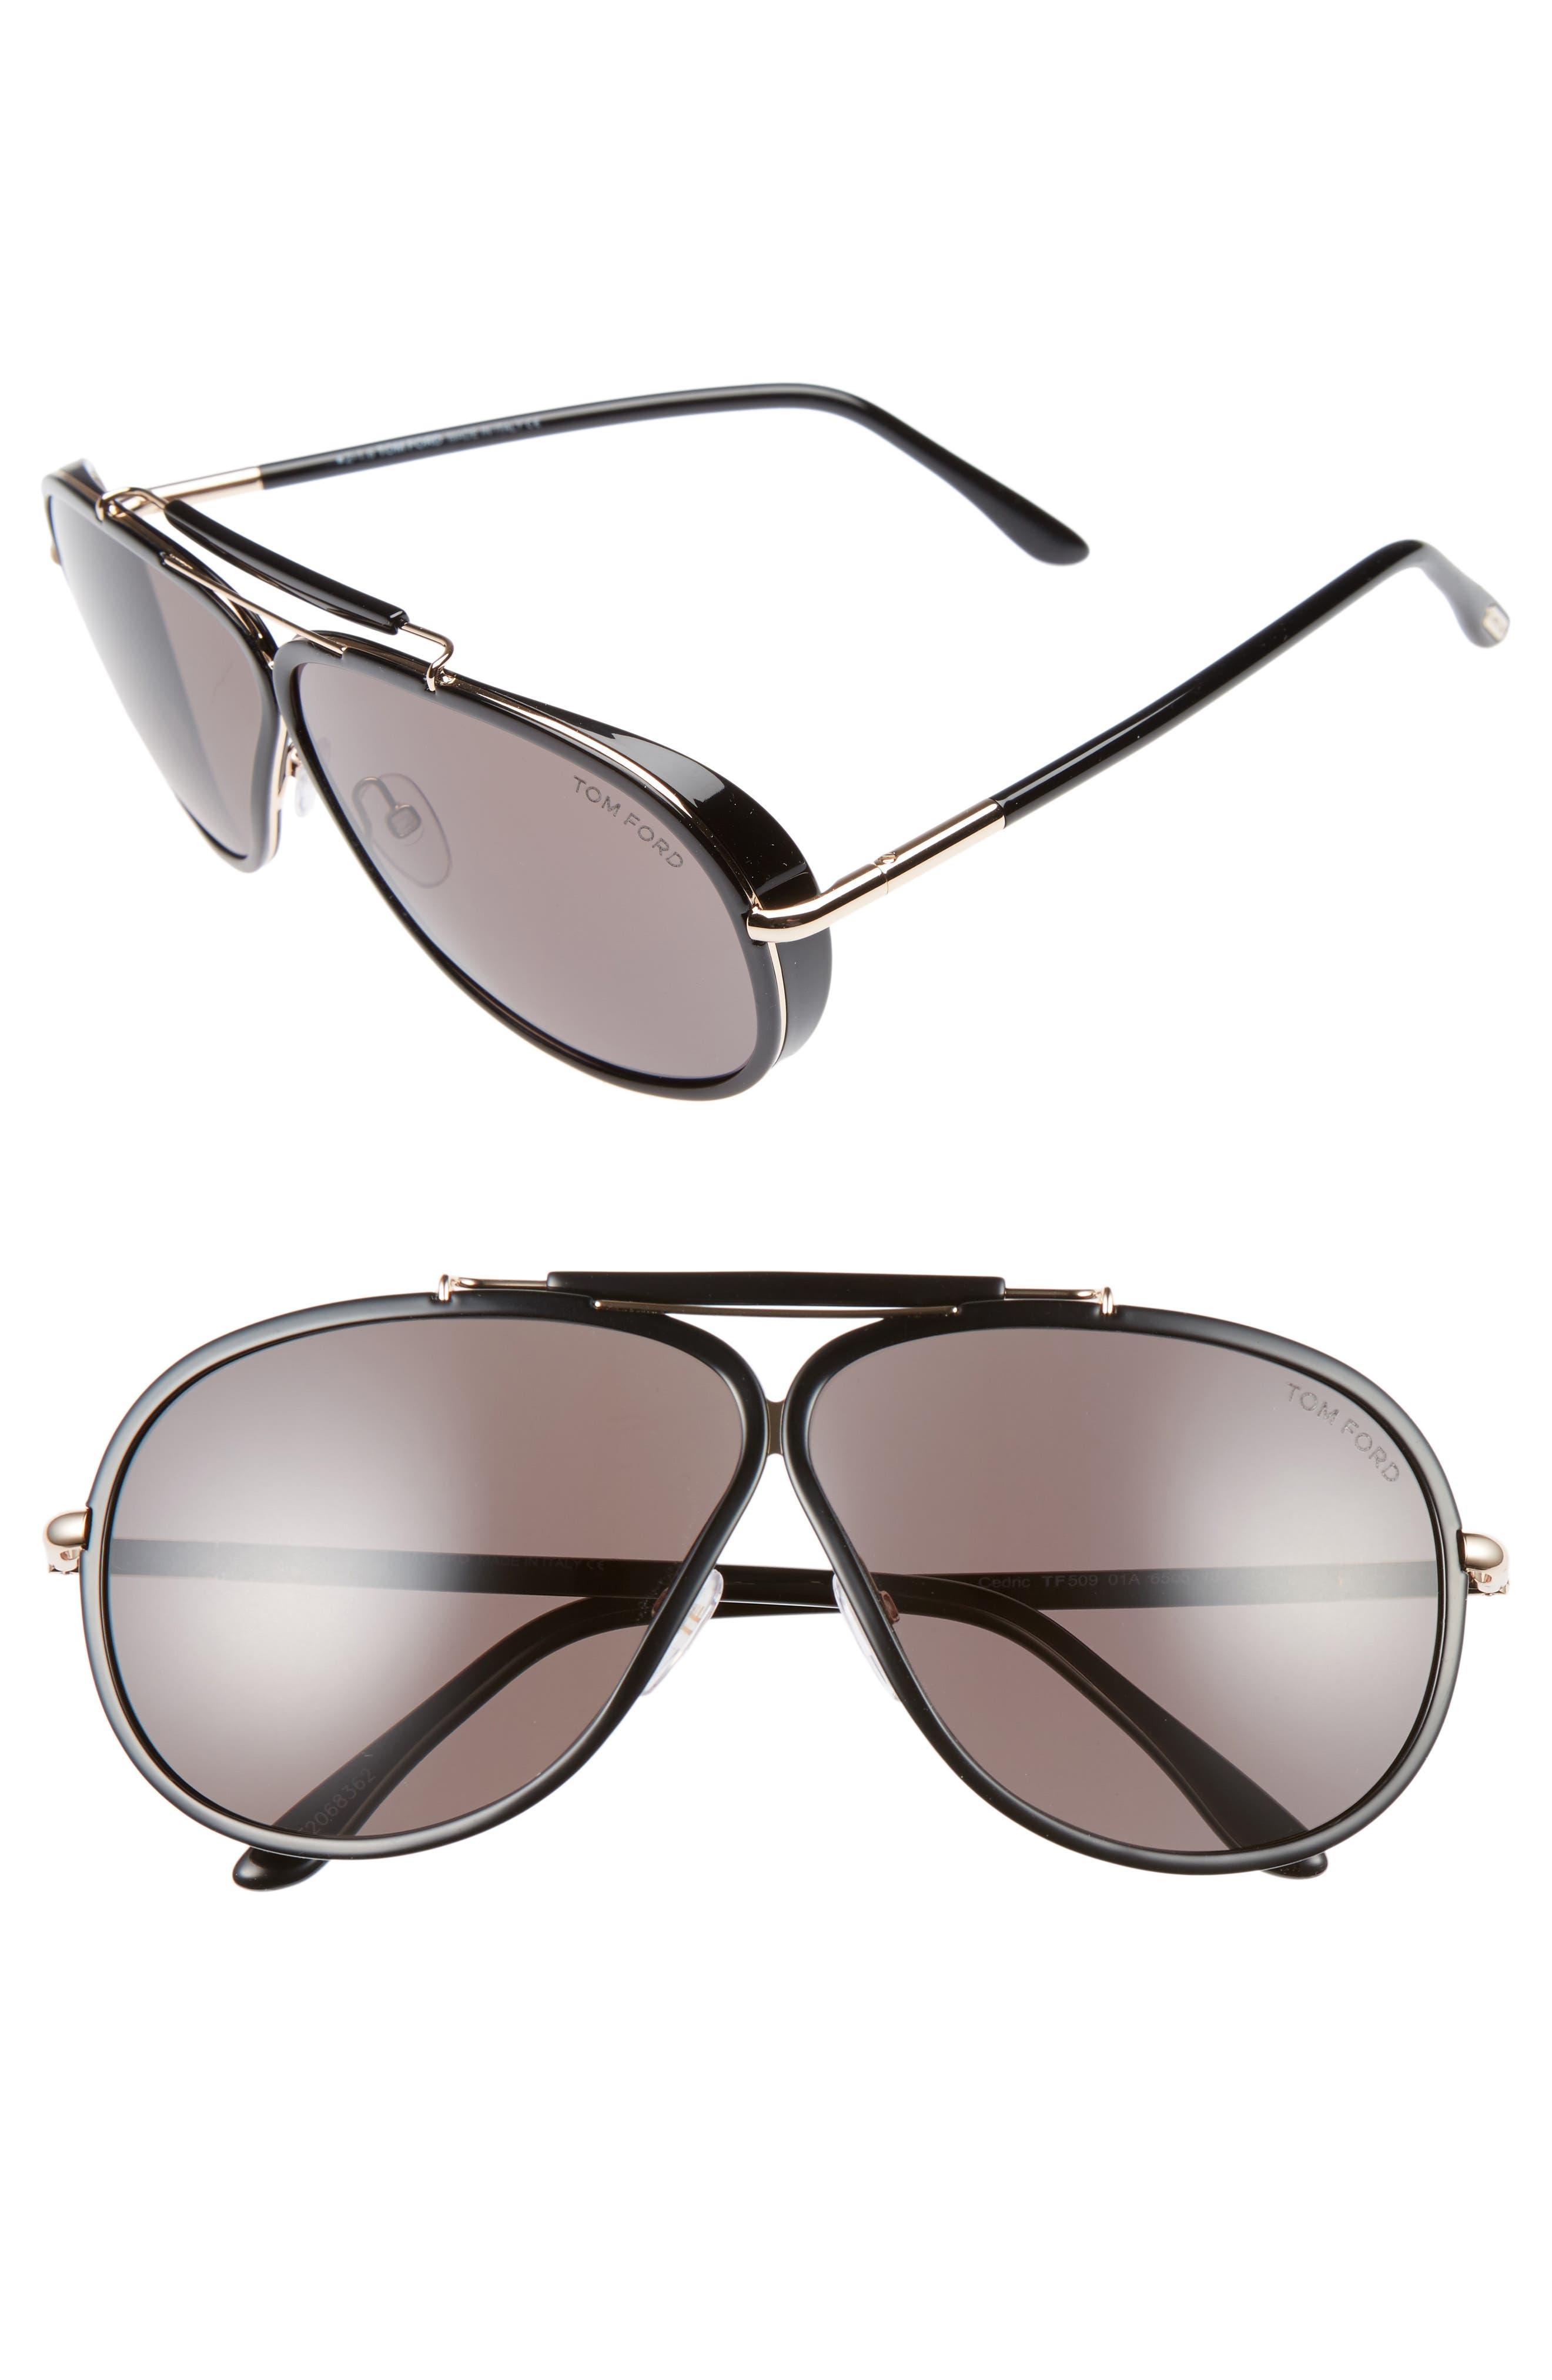 Cedric 65mm Aviator Sunglasses,                             Main thumbnail 1, color,                             710